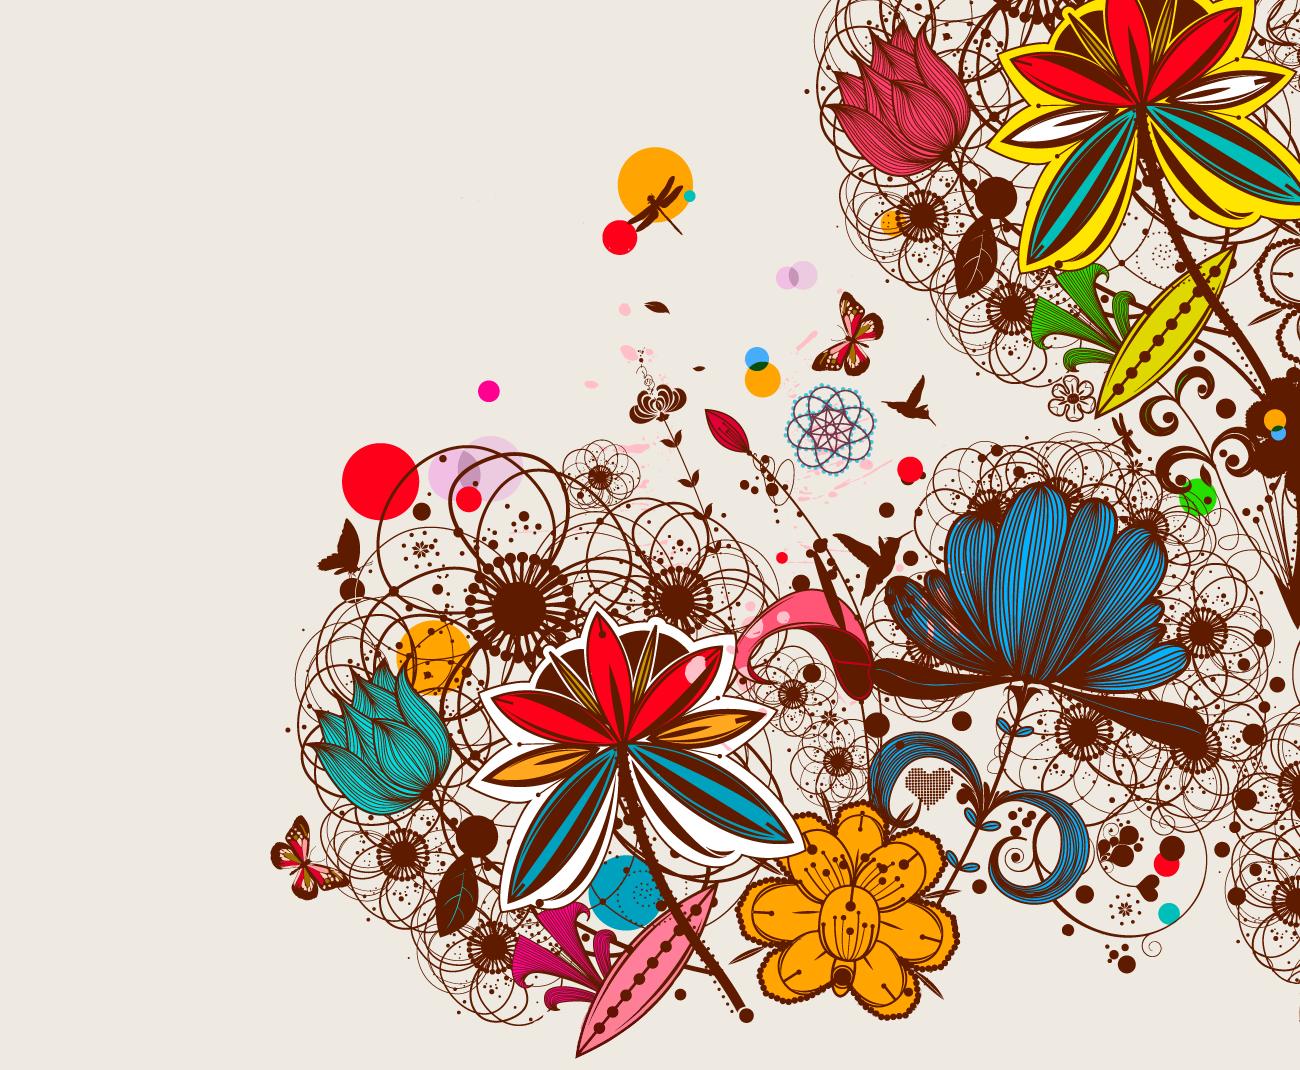 New Website Online Store Design 1300x1070